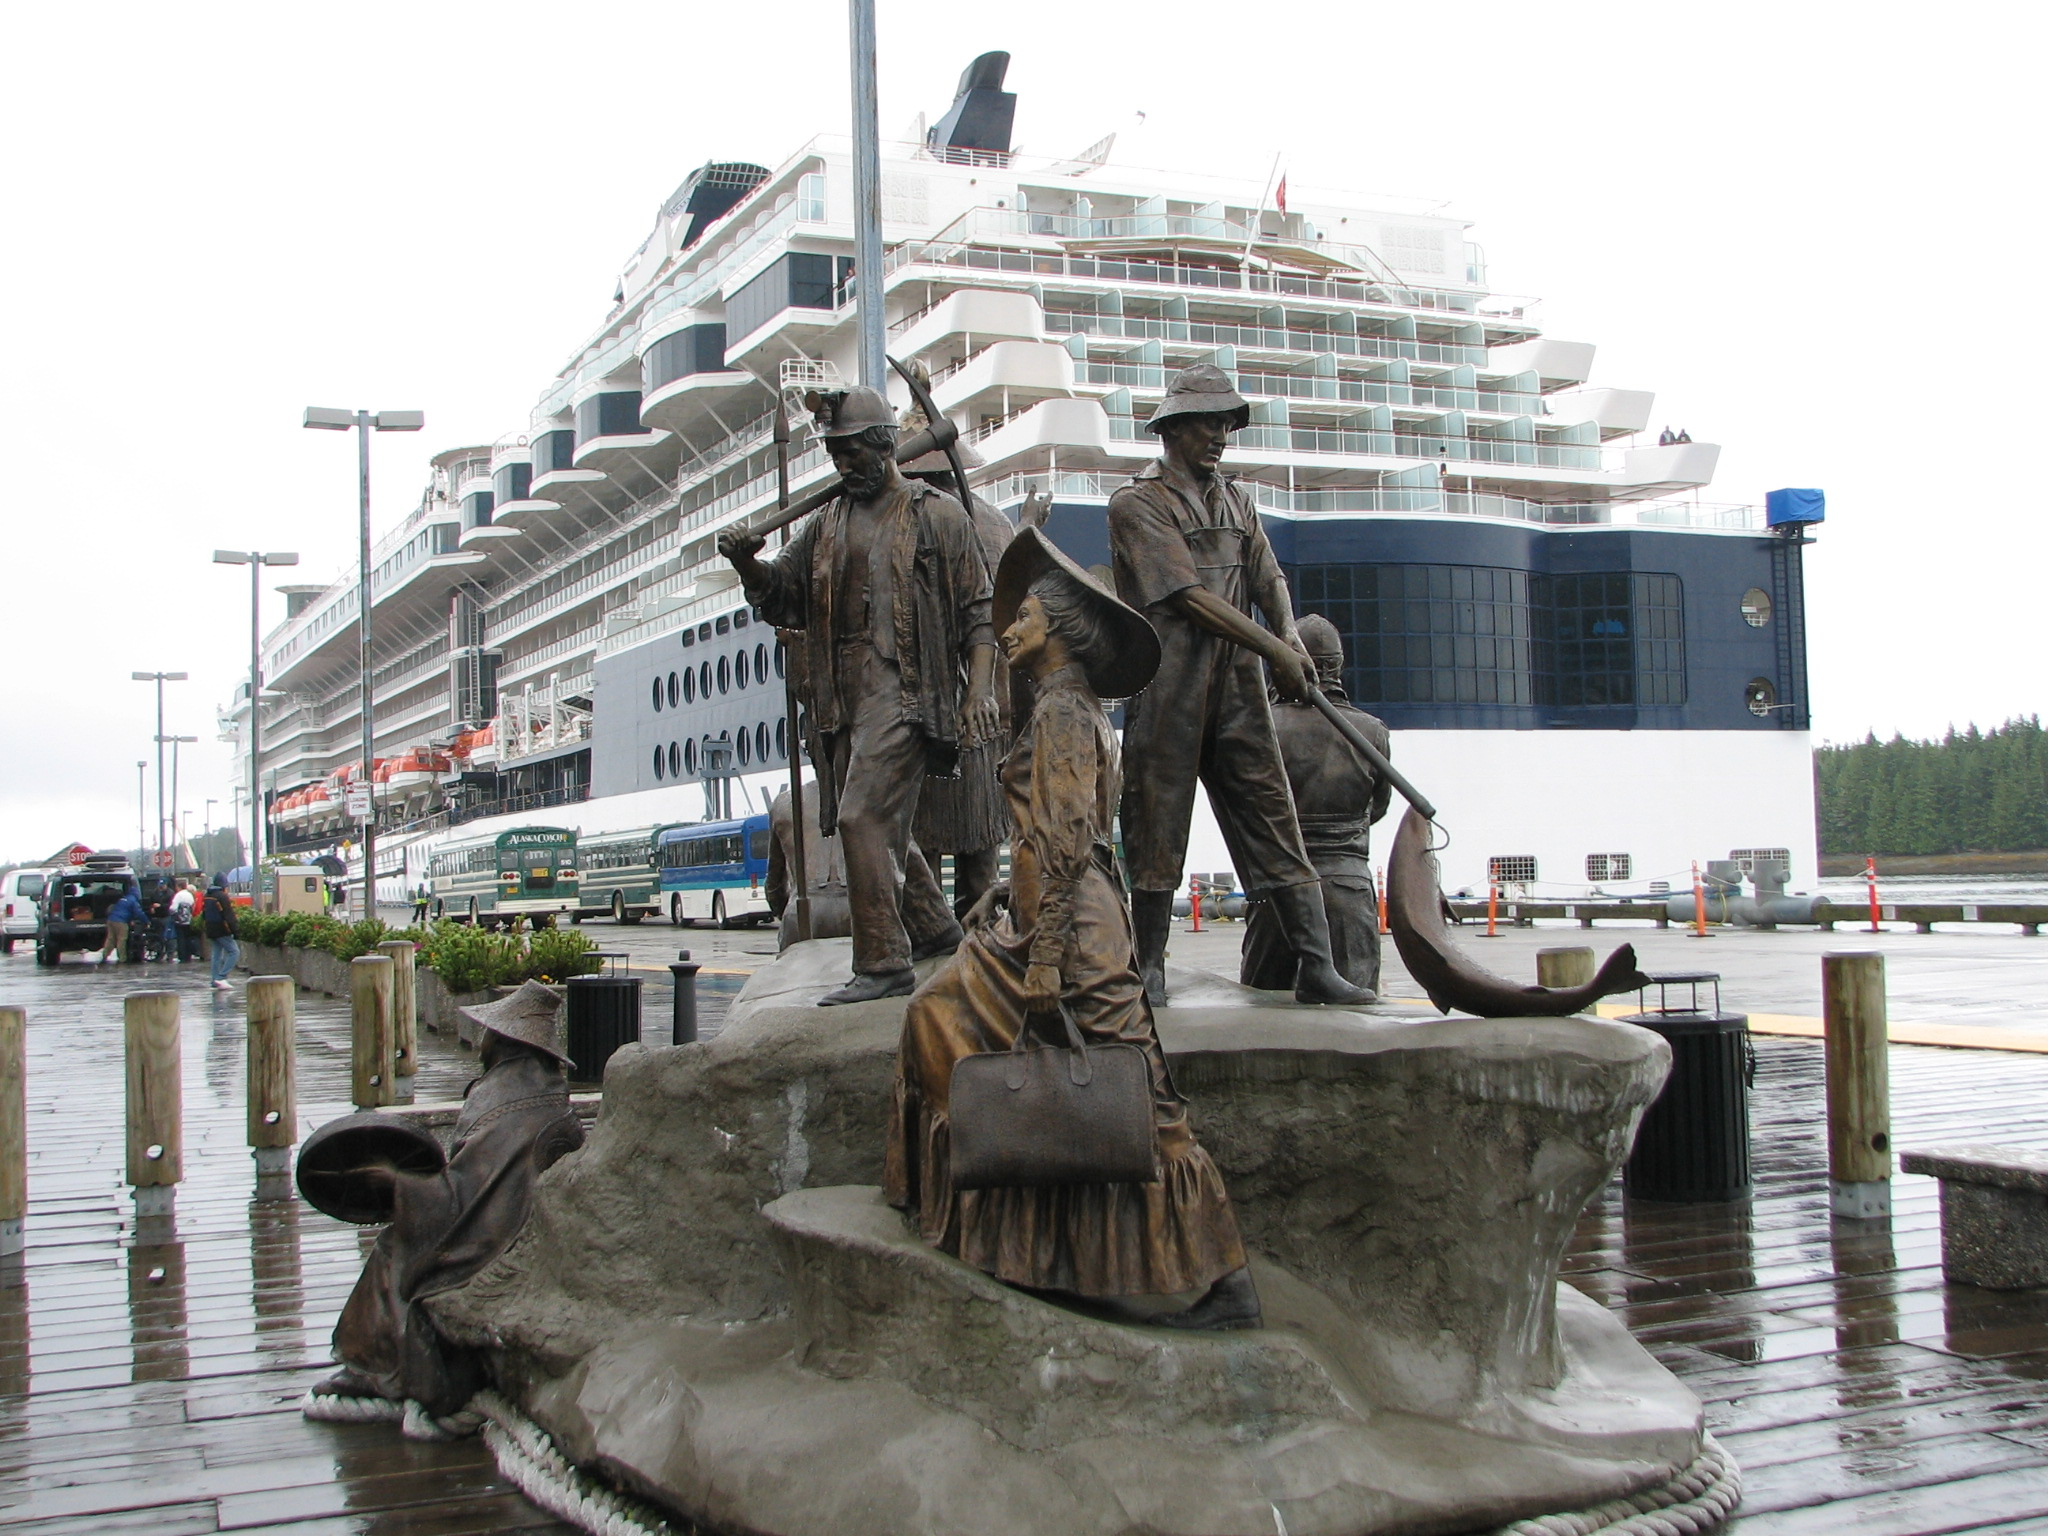 Alaska - Cruise and Statue